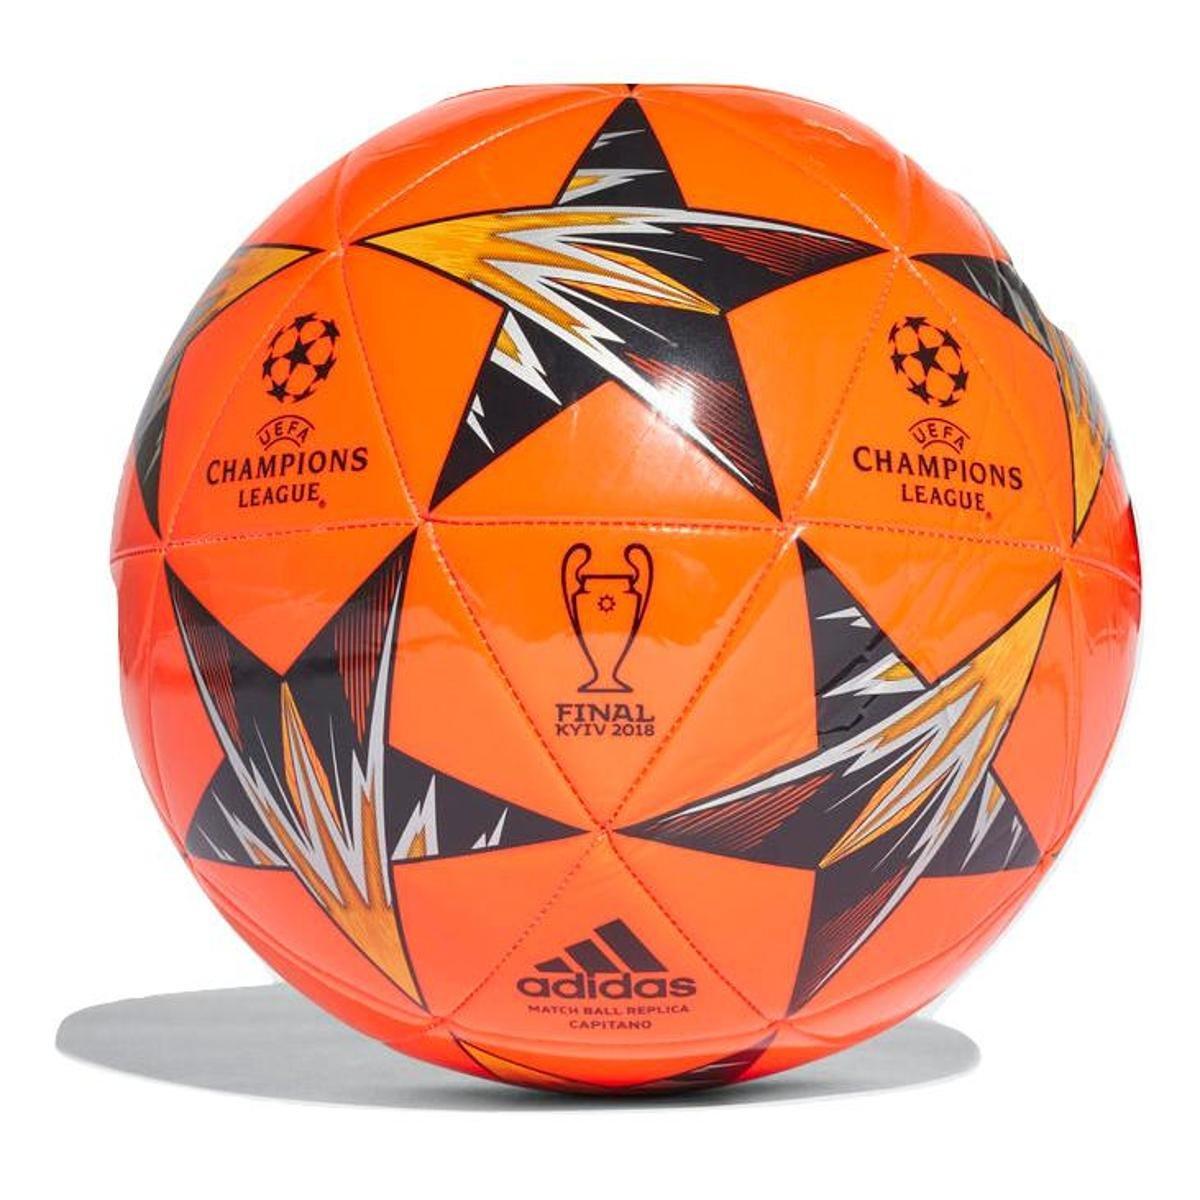 199b48577b Bola Futebol Campo Adidas Finale Kiev Capitano